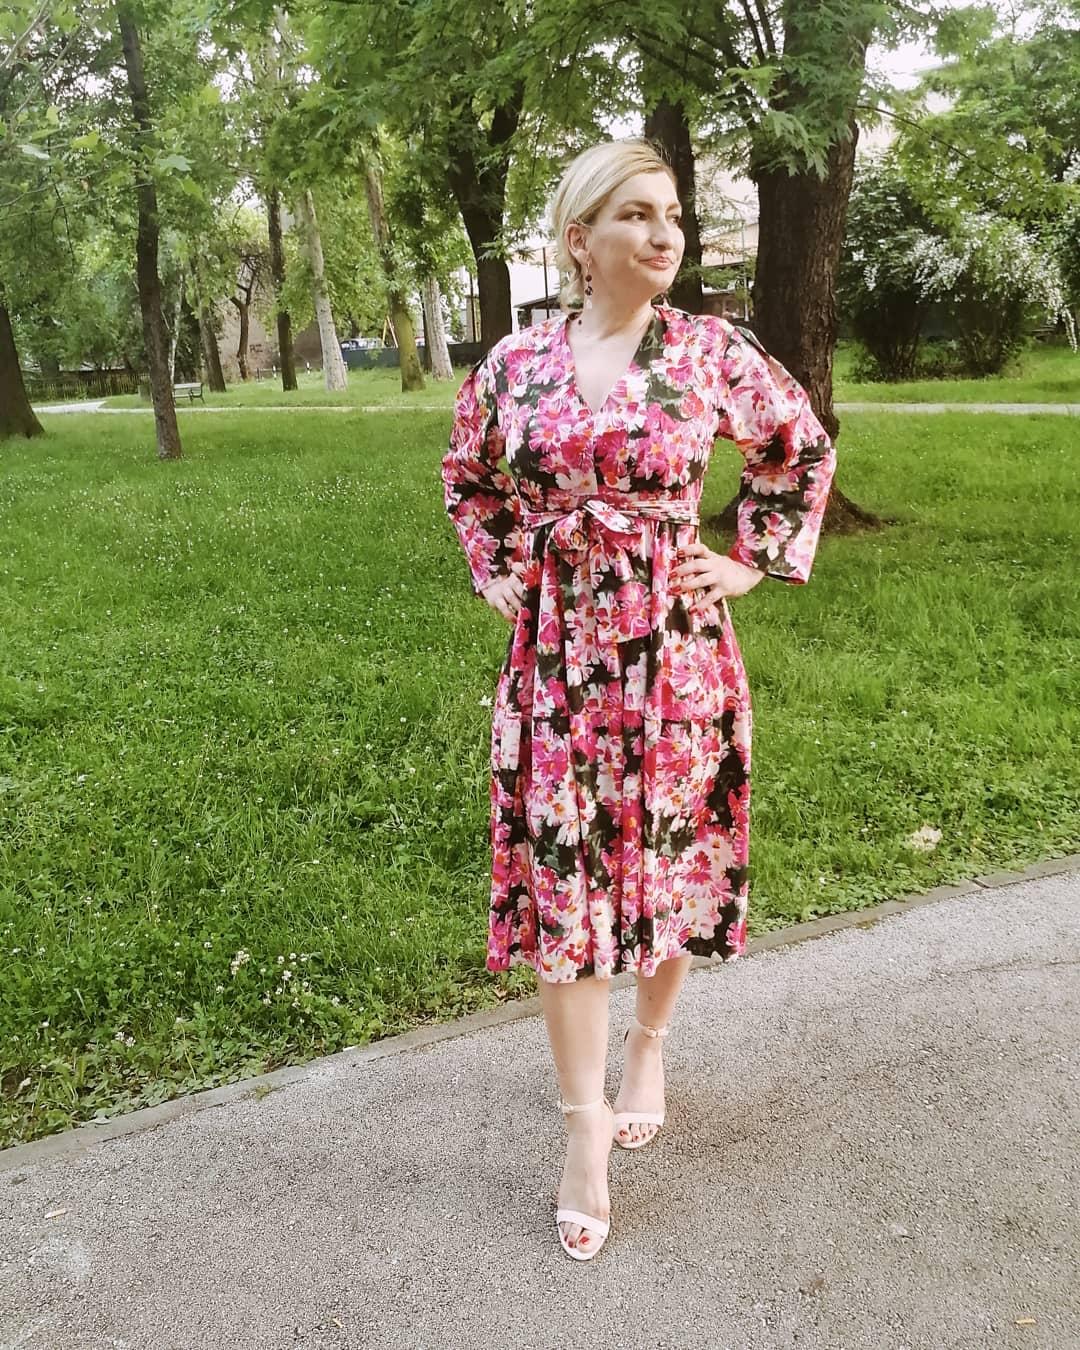 printed dress with belt de Zara sur aida_n_s sur SCANDALOOK